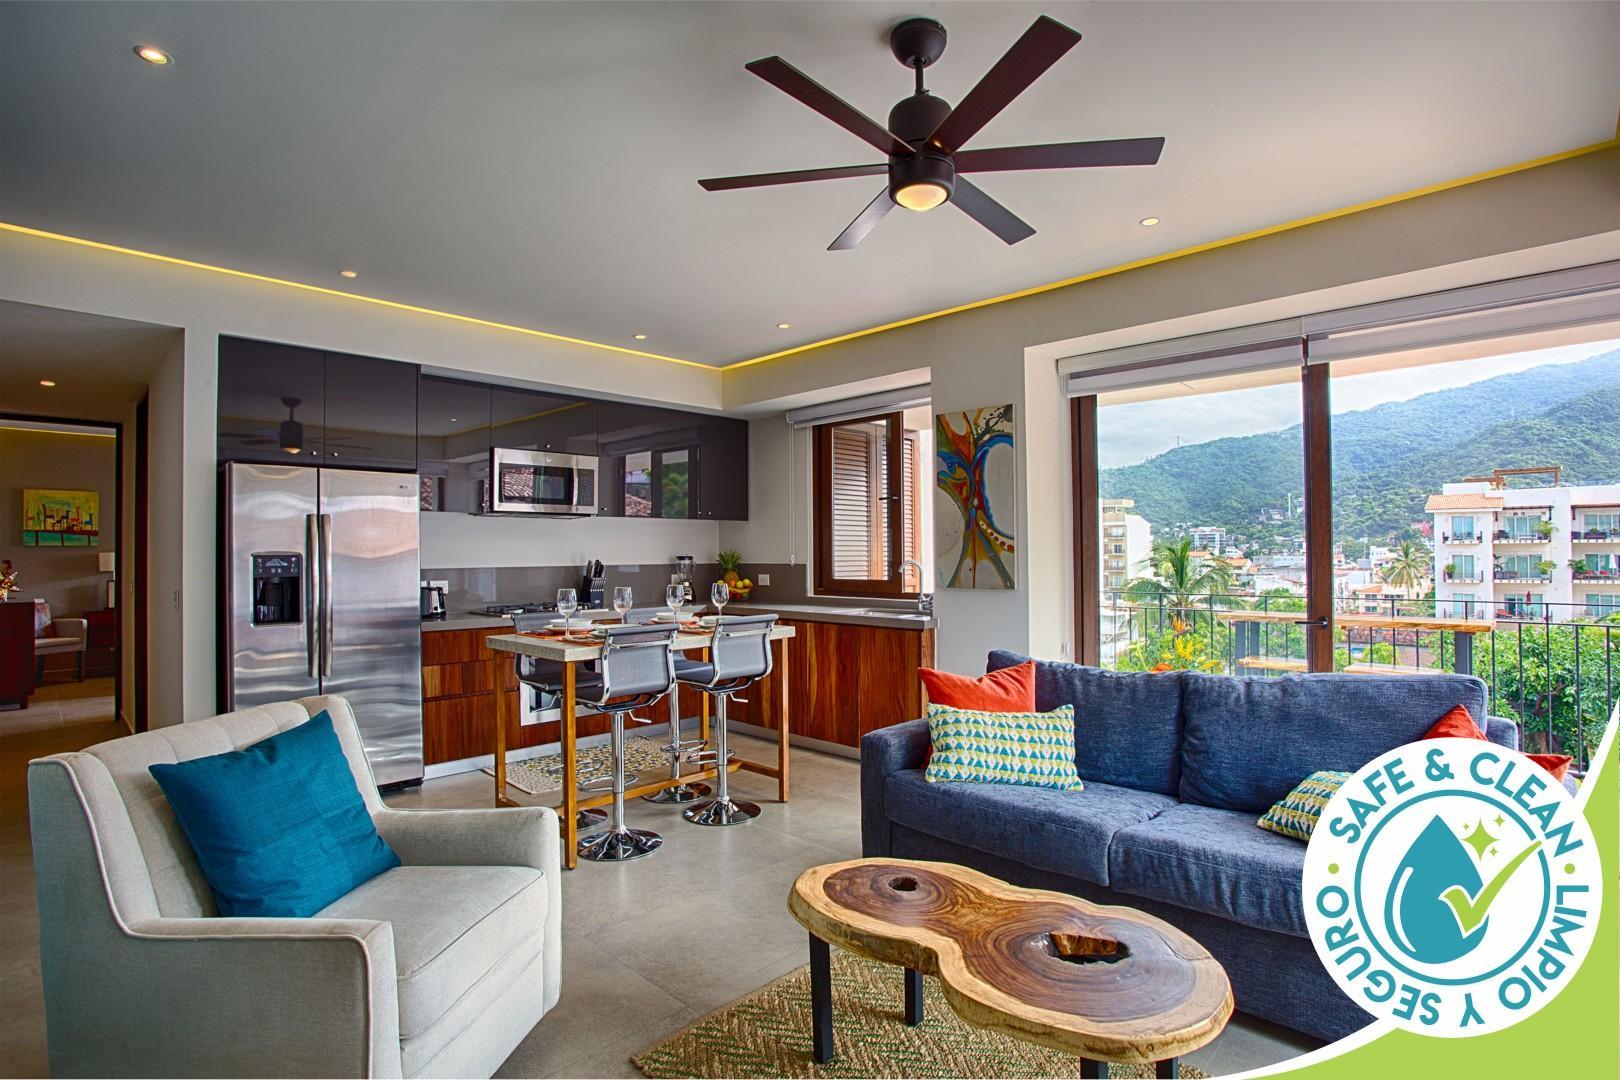 Mountain View Condo @ Oceana | Rooftop Pool, Best Gym, Romantic Zone